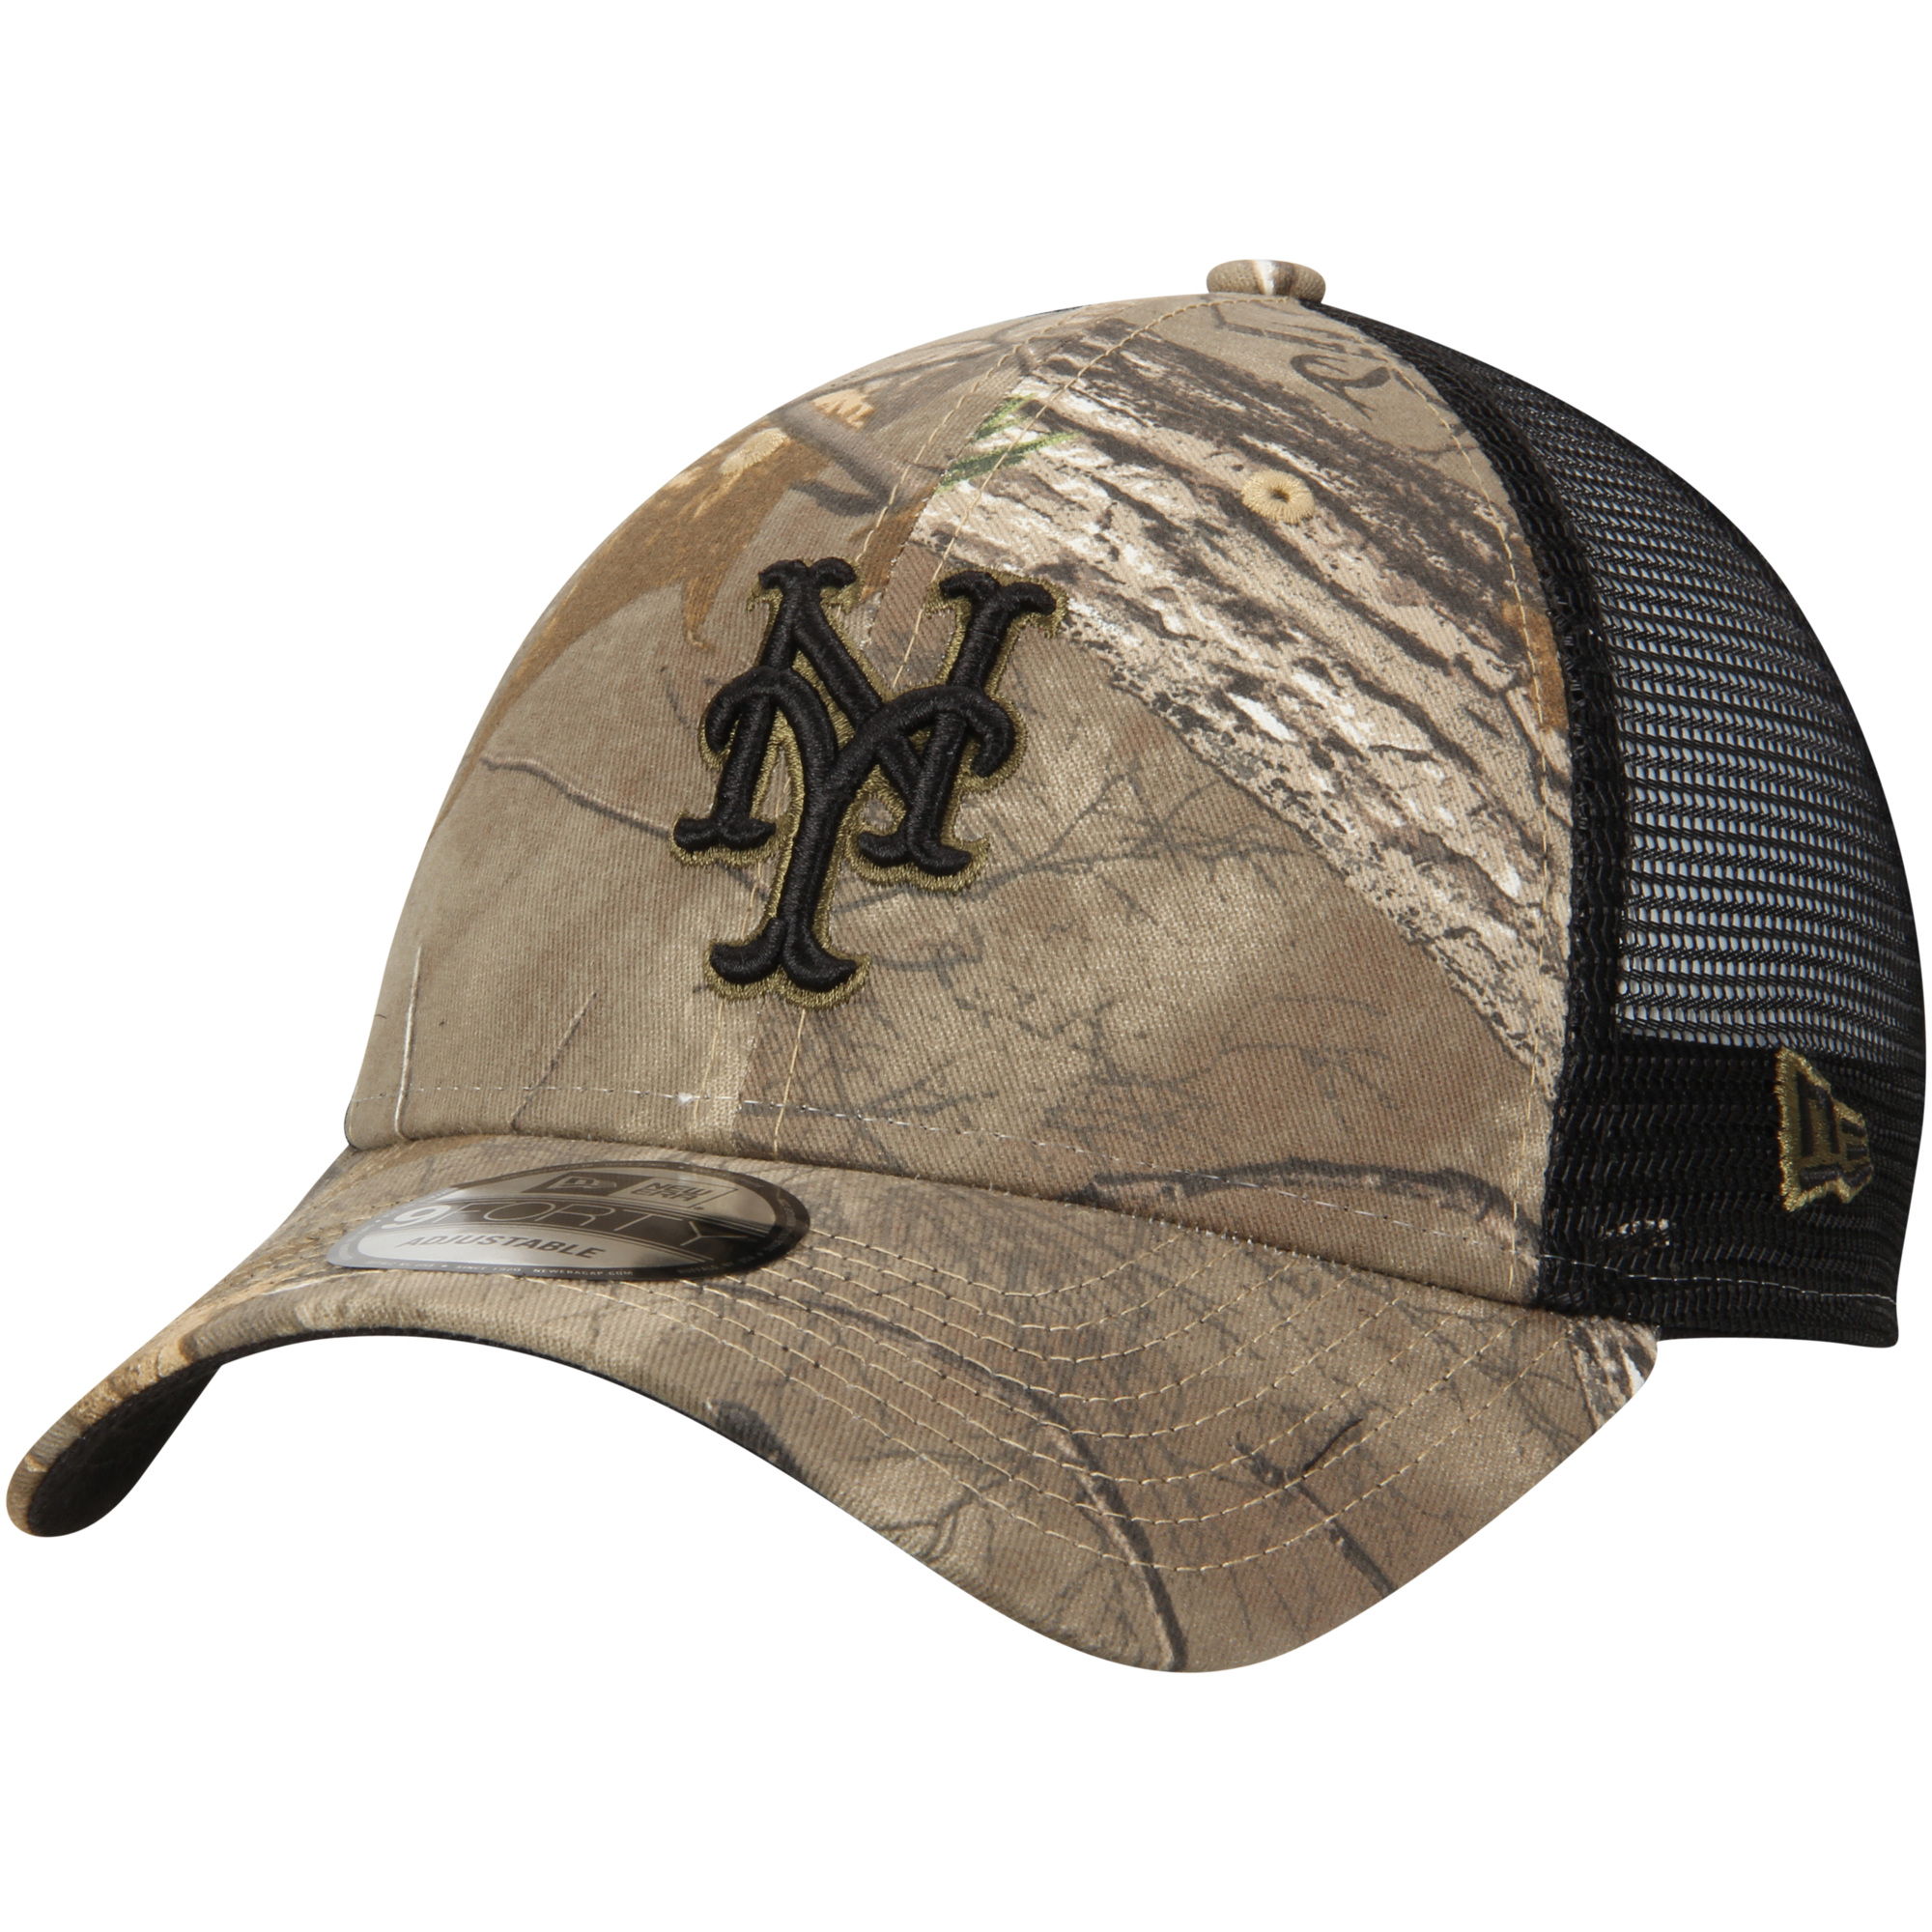 New York Mets New Era Realtree Trucker 9FORTY Adjustable Snapback Hat - Camo/Black - OSFA